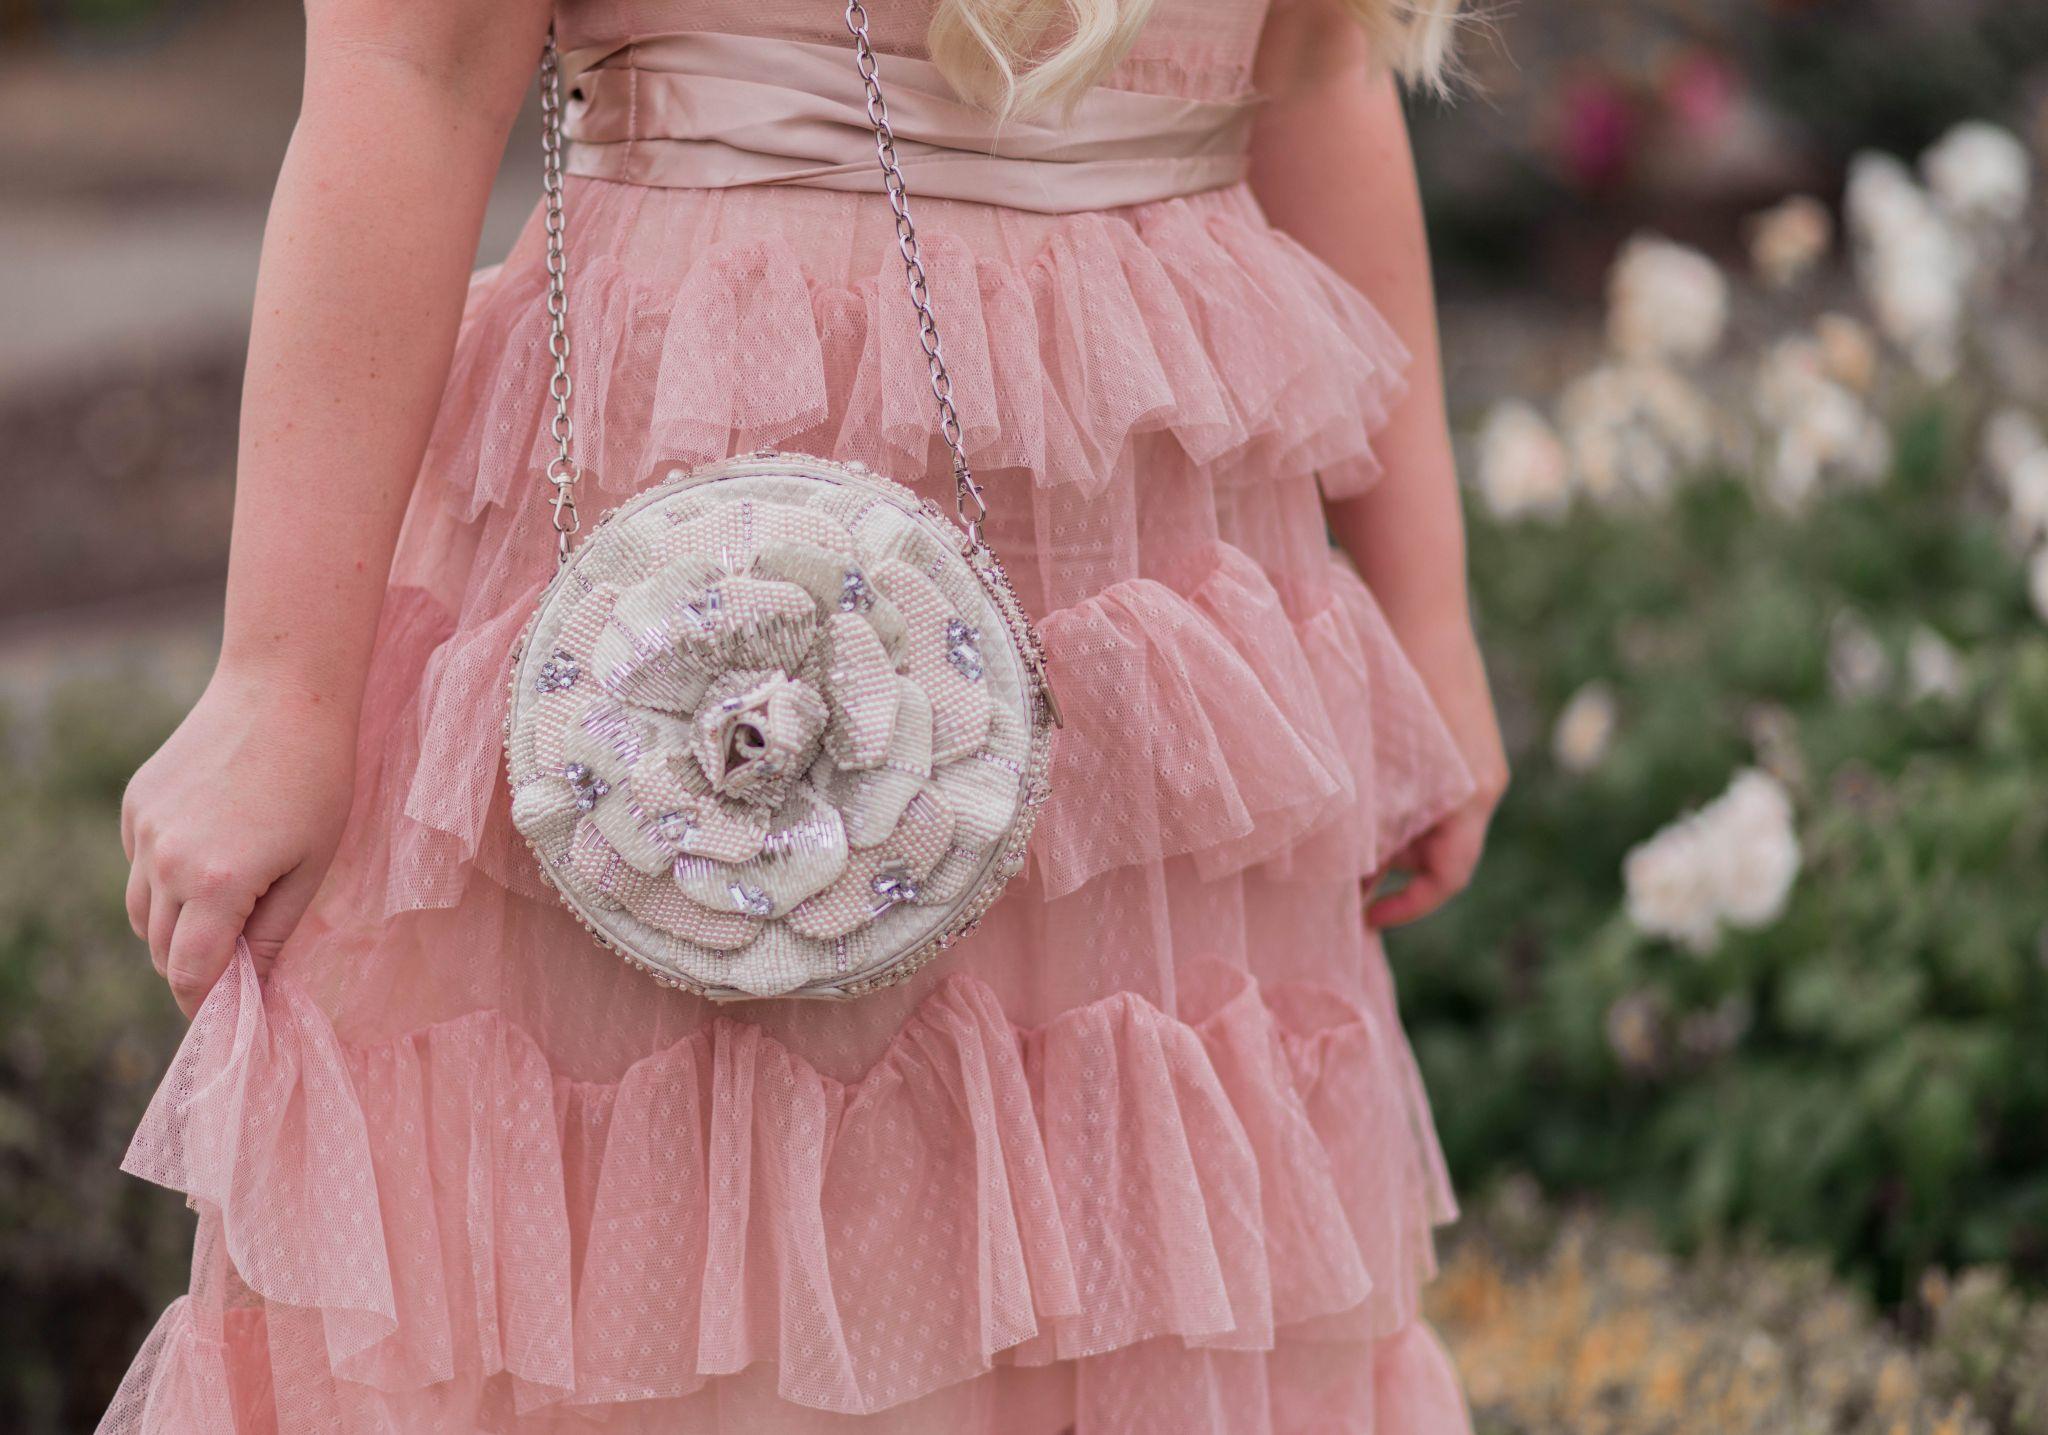 Fashion Blogger Elizabeth Hugen of Lizzie in Lace shares her Mary Frances designer handbag collection including this gorgeous floral bridal handbag